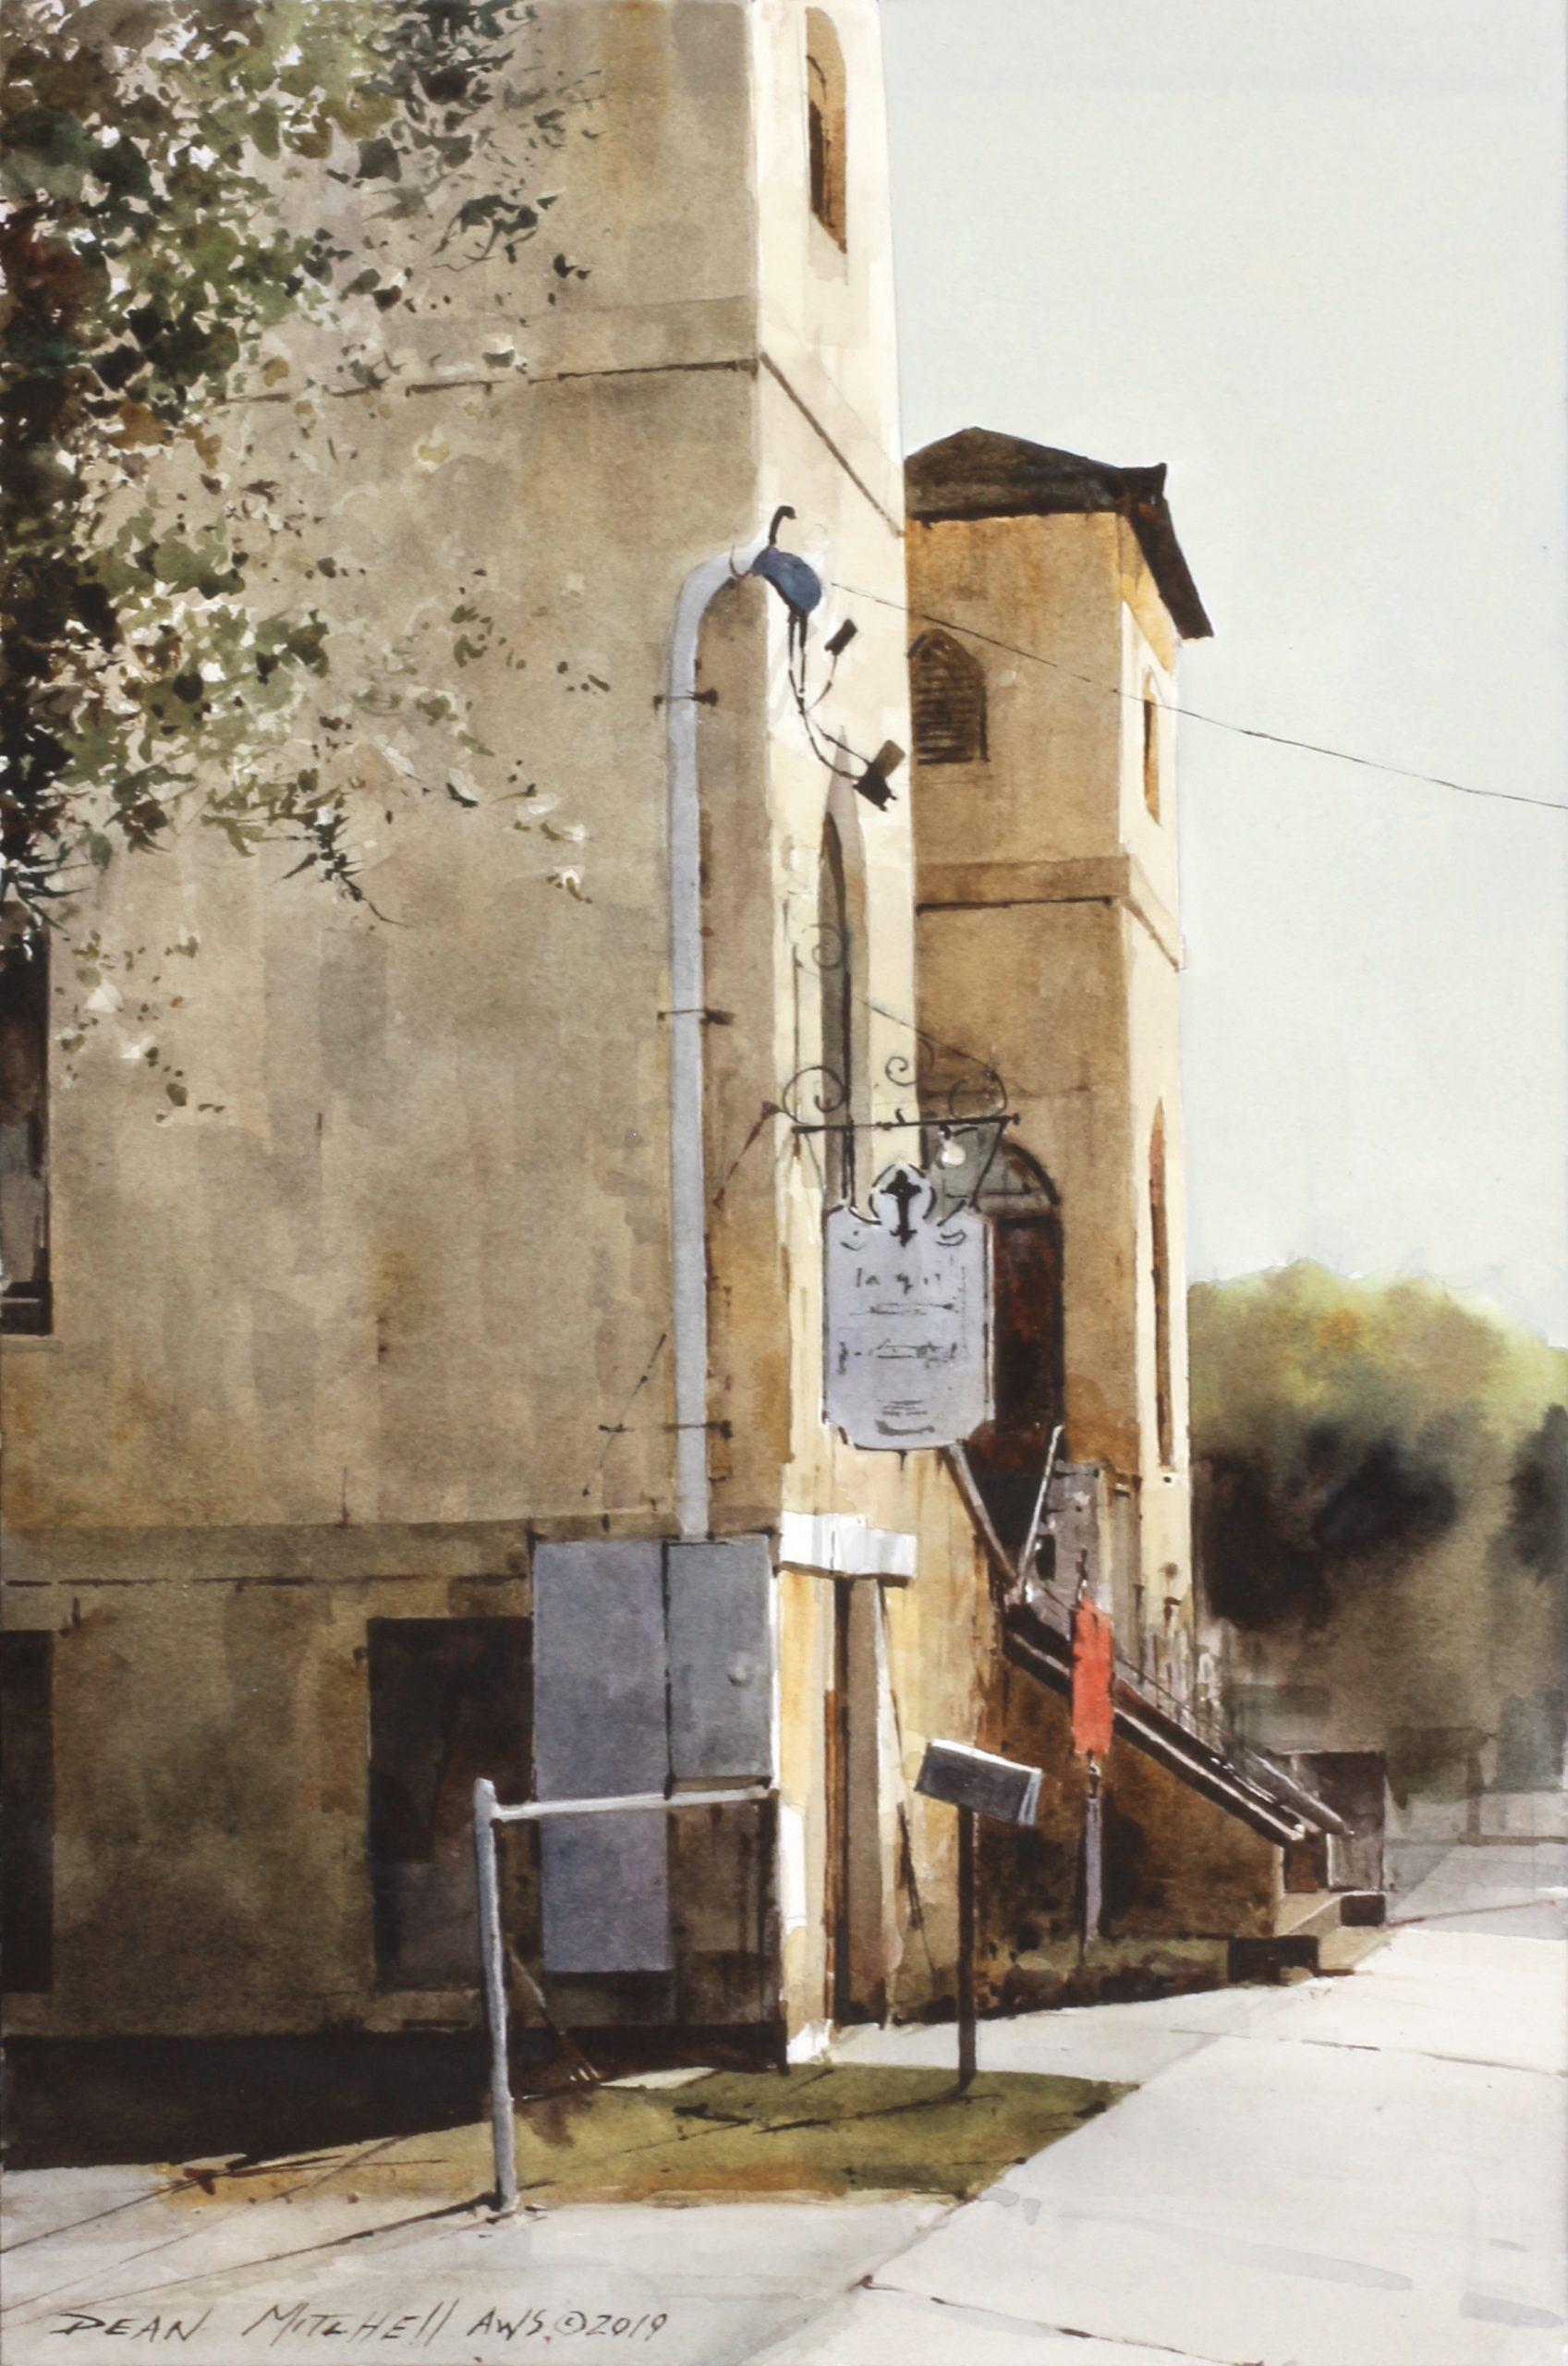 dean mitchell original painting